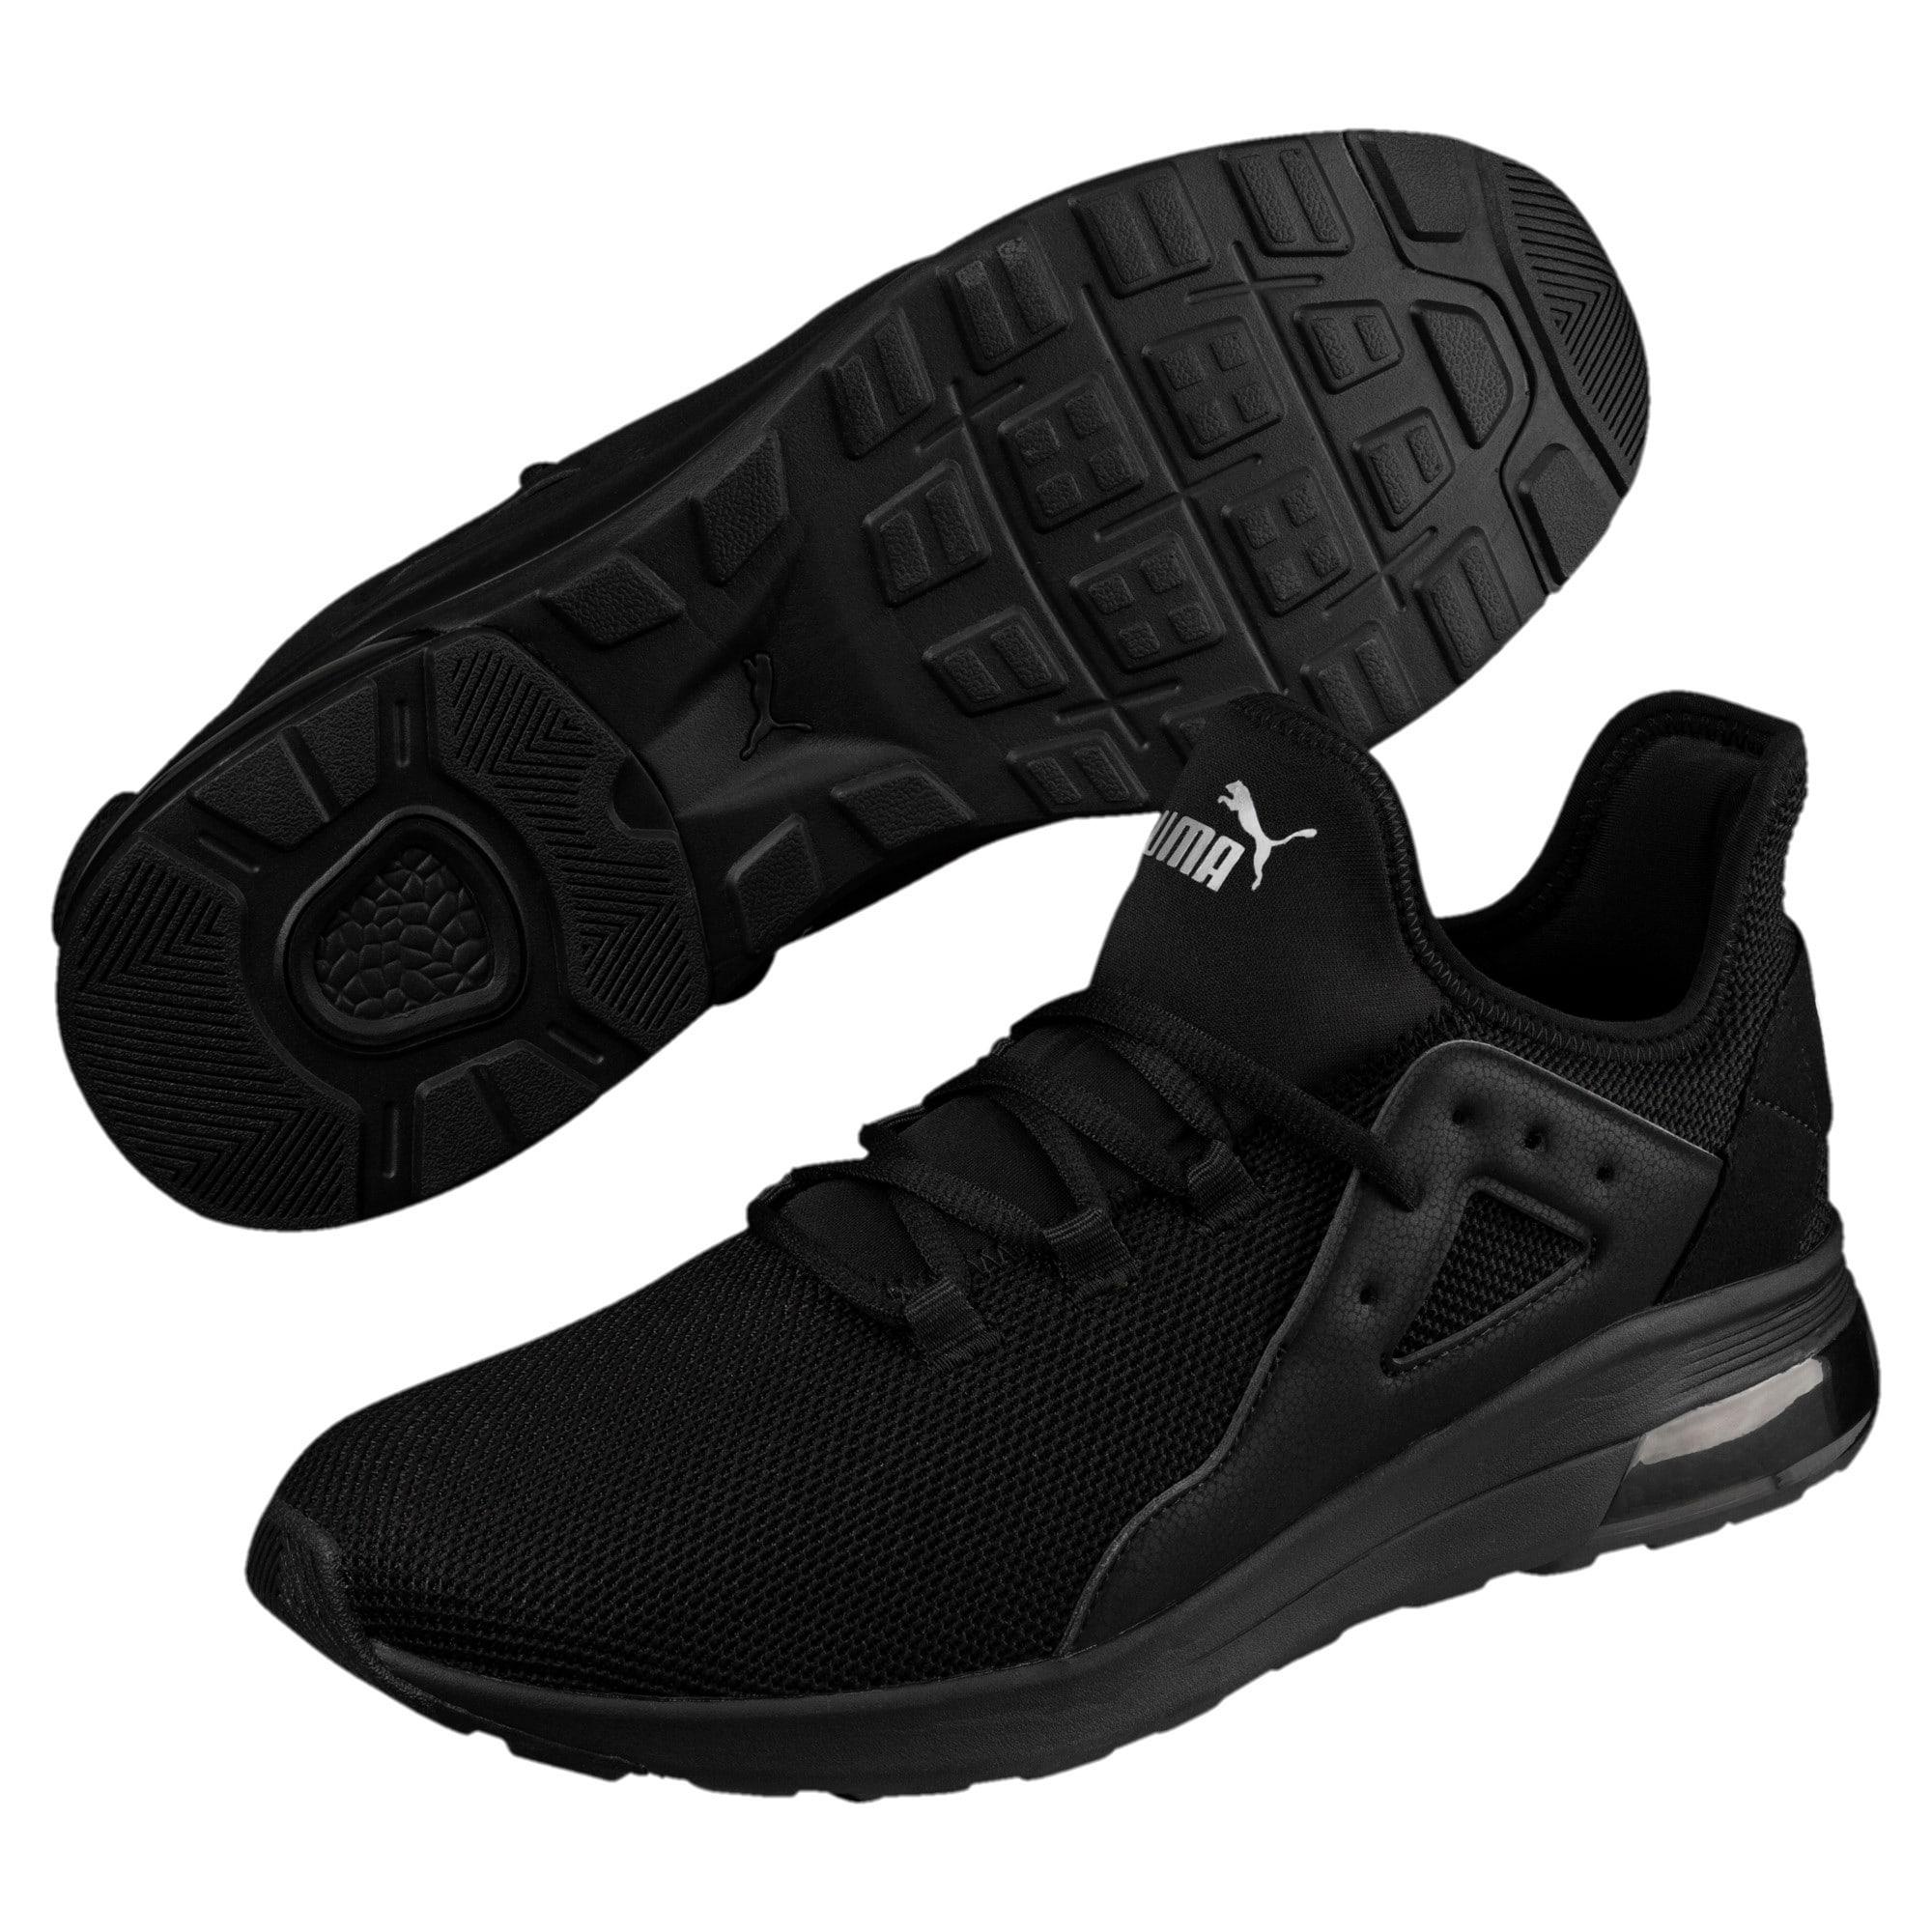 Thumbnail 6 of Electron Street Trainers, Puma Black-Puma Black-Black, medium-IND